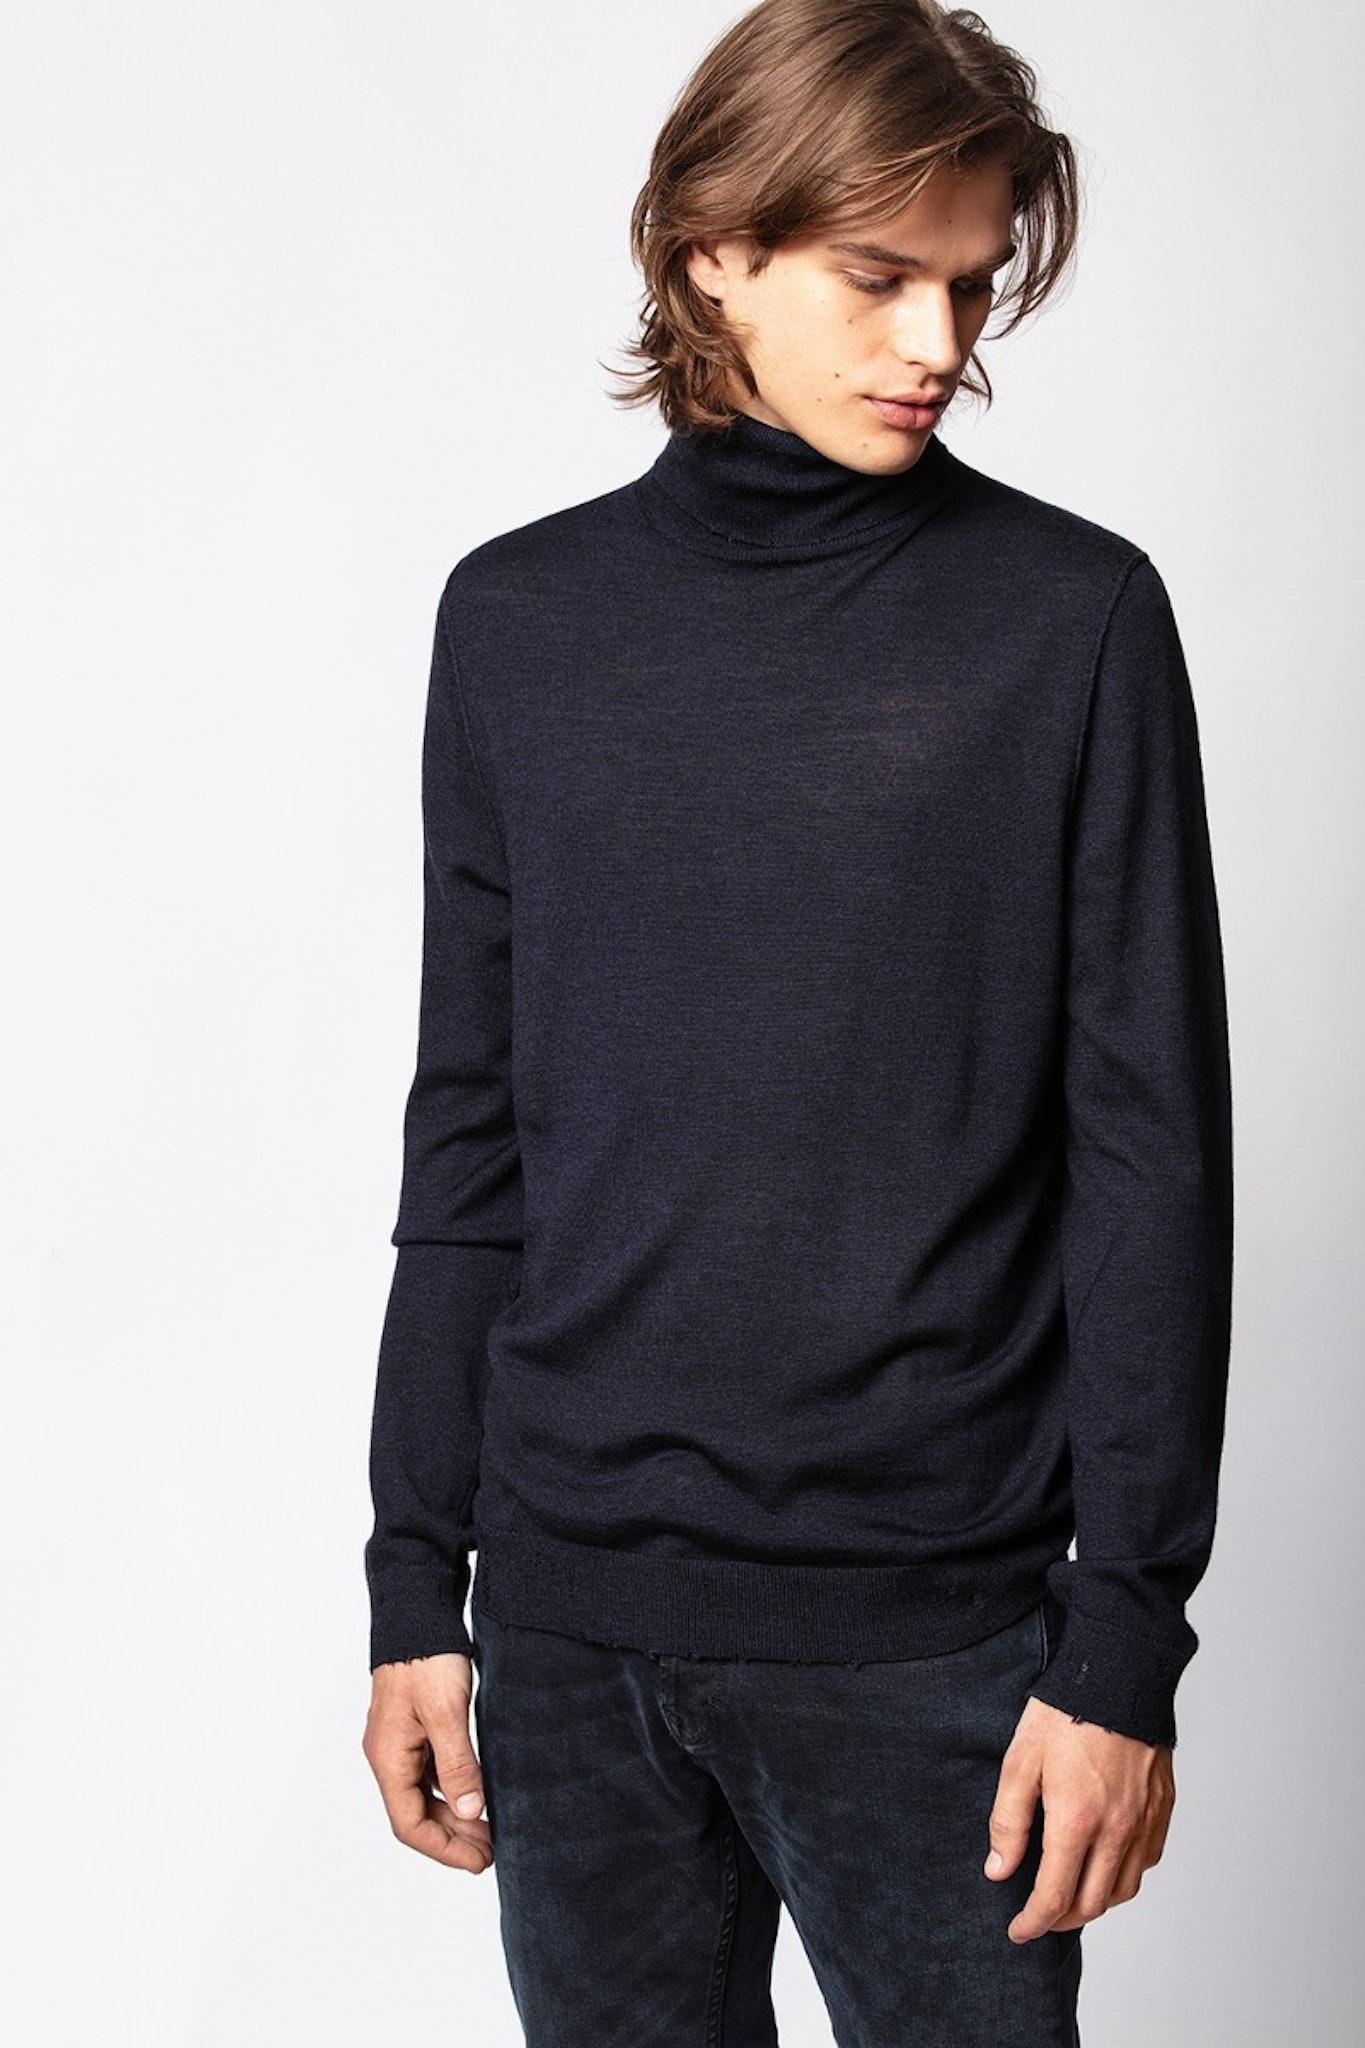 Bobby Sweater